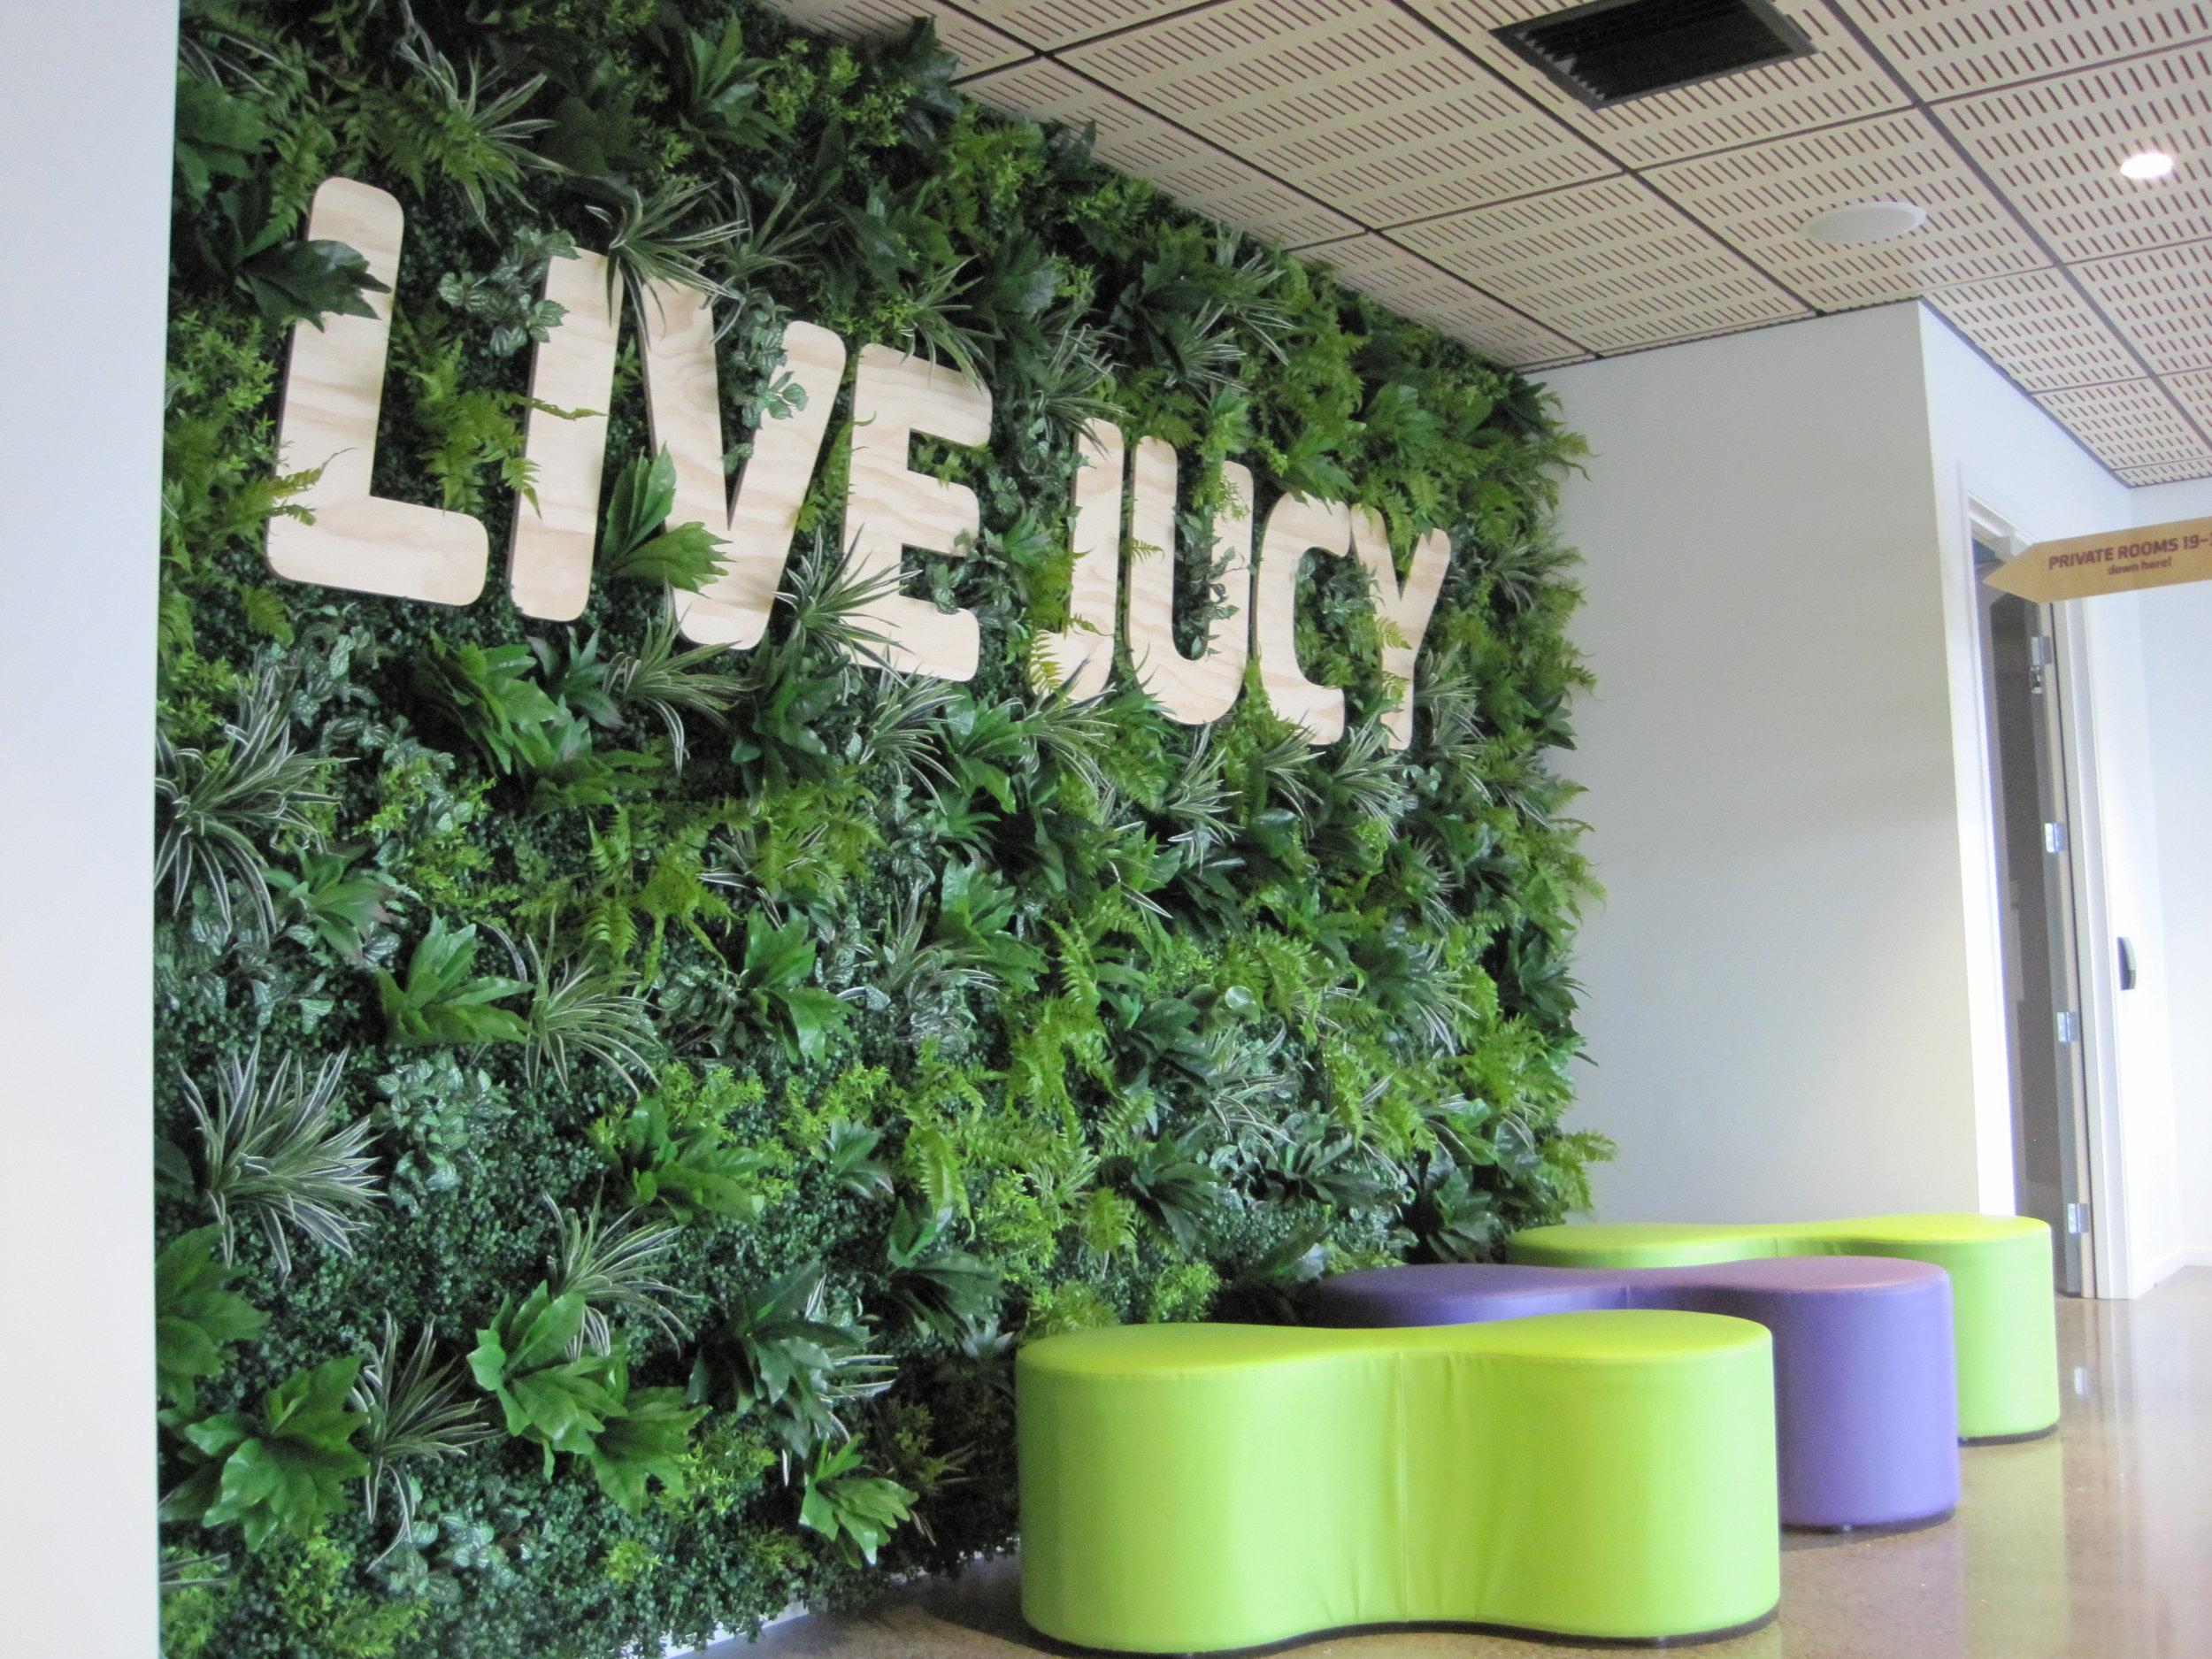 Jucy Snooze Lobby Green Wall